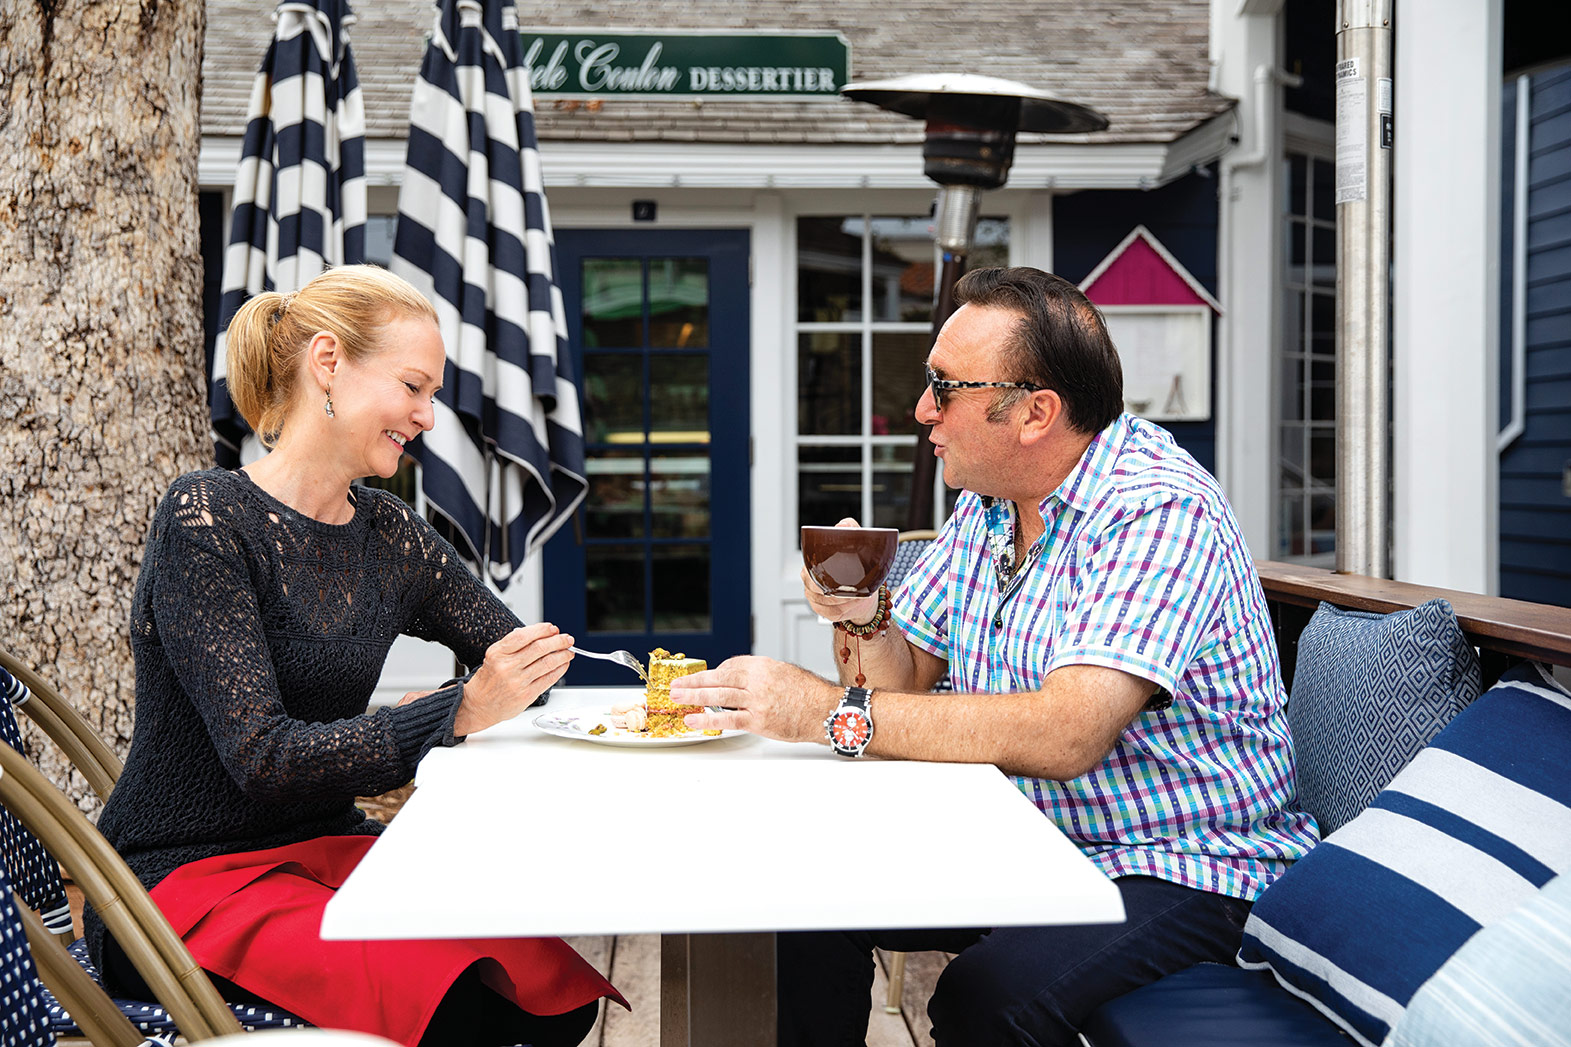 Chef Bernard Guillas san diego restaurant michele Coulon dessertier bakery